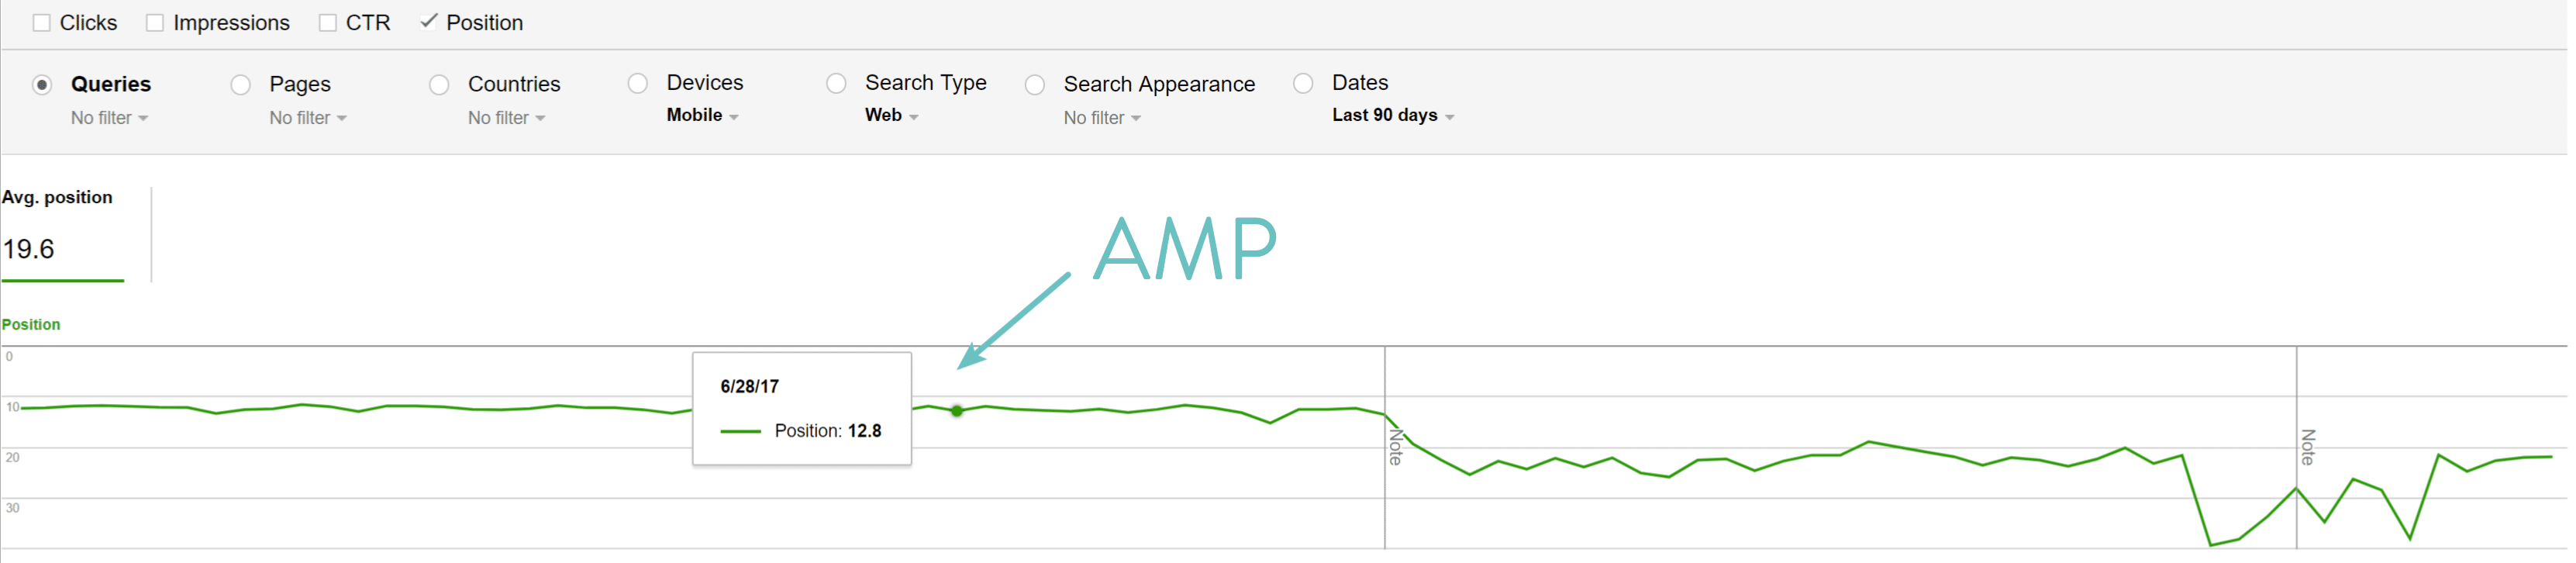 Google AMP positions data